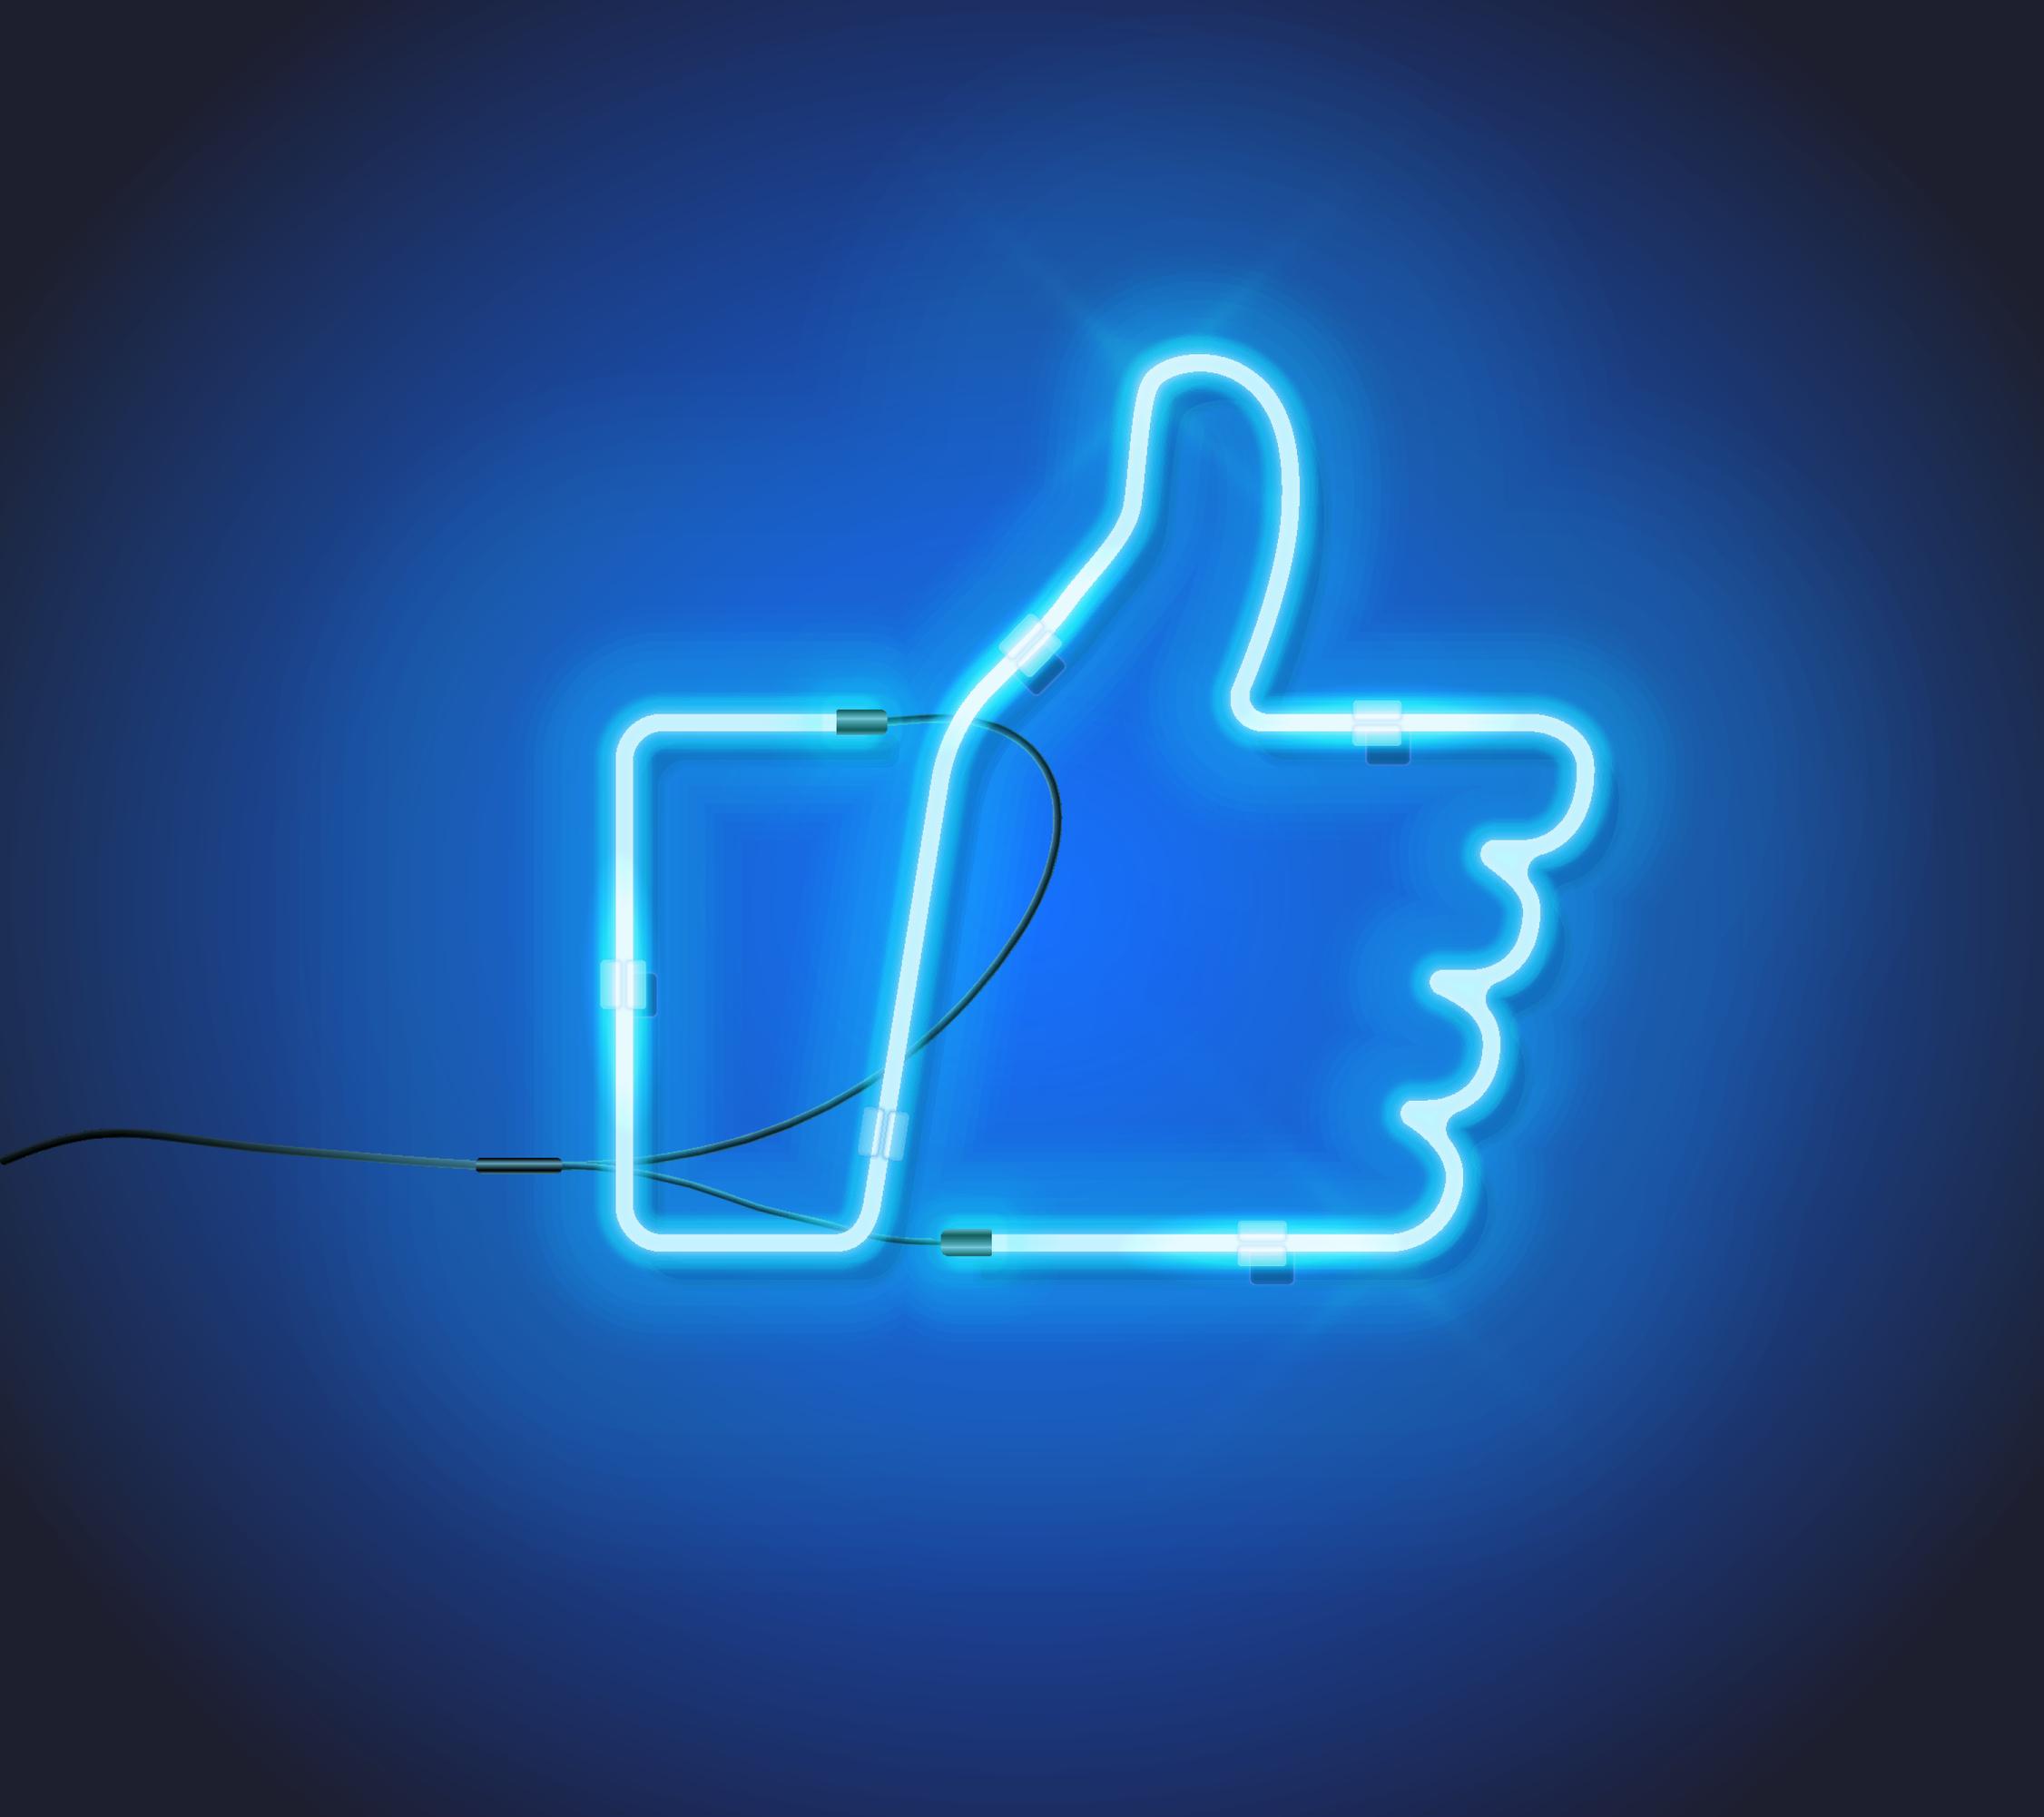 #WeLike: Social Media bei ProSiebenSat.1